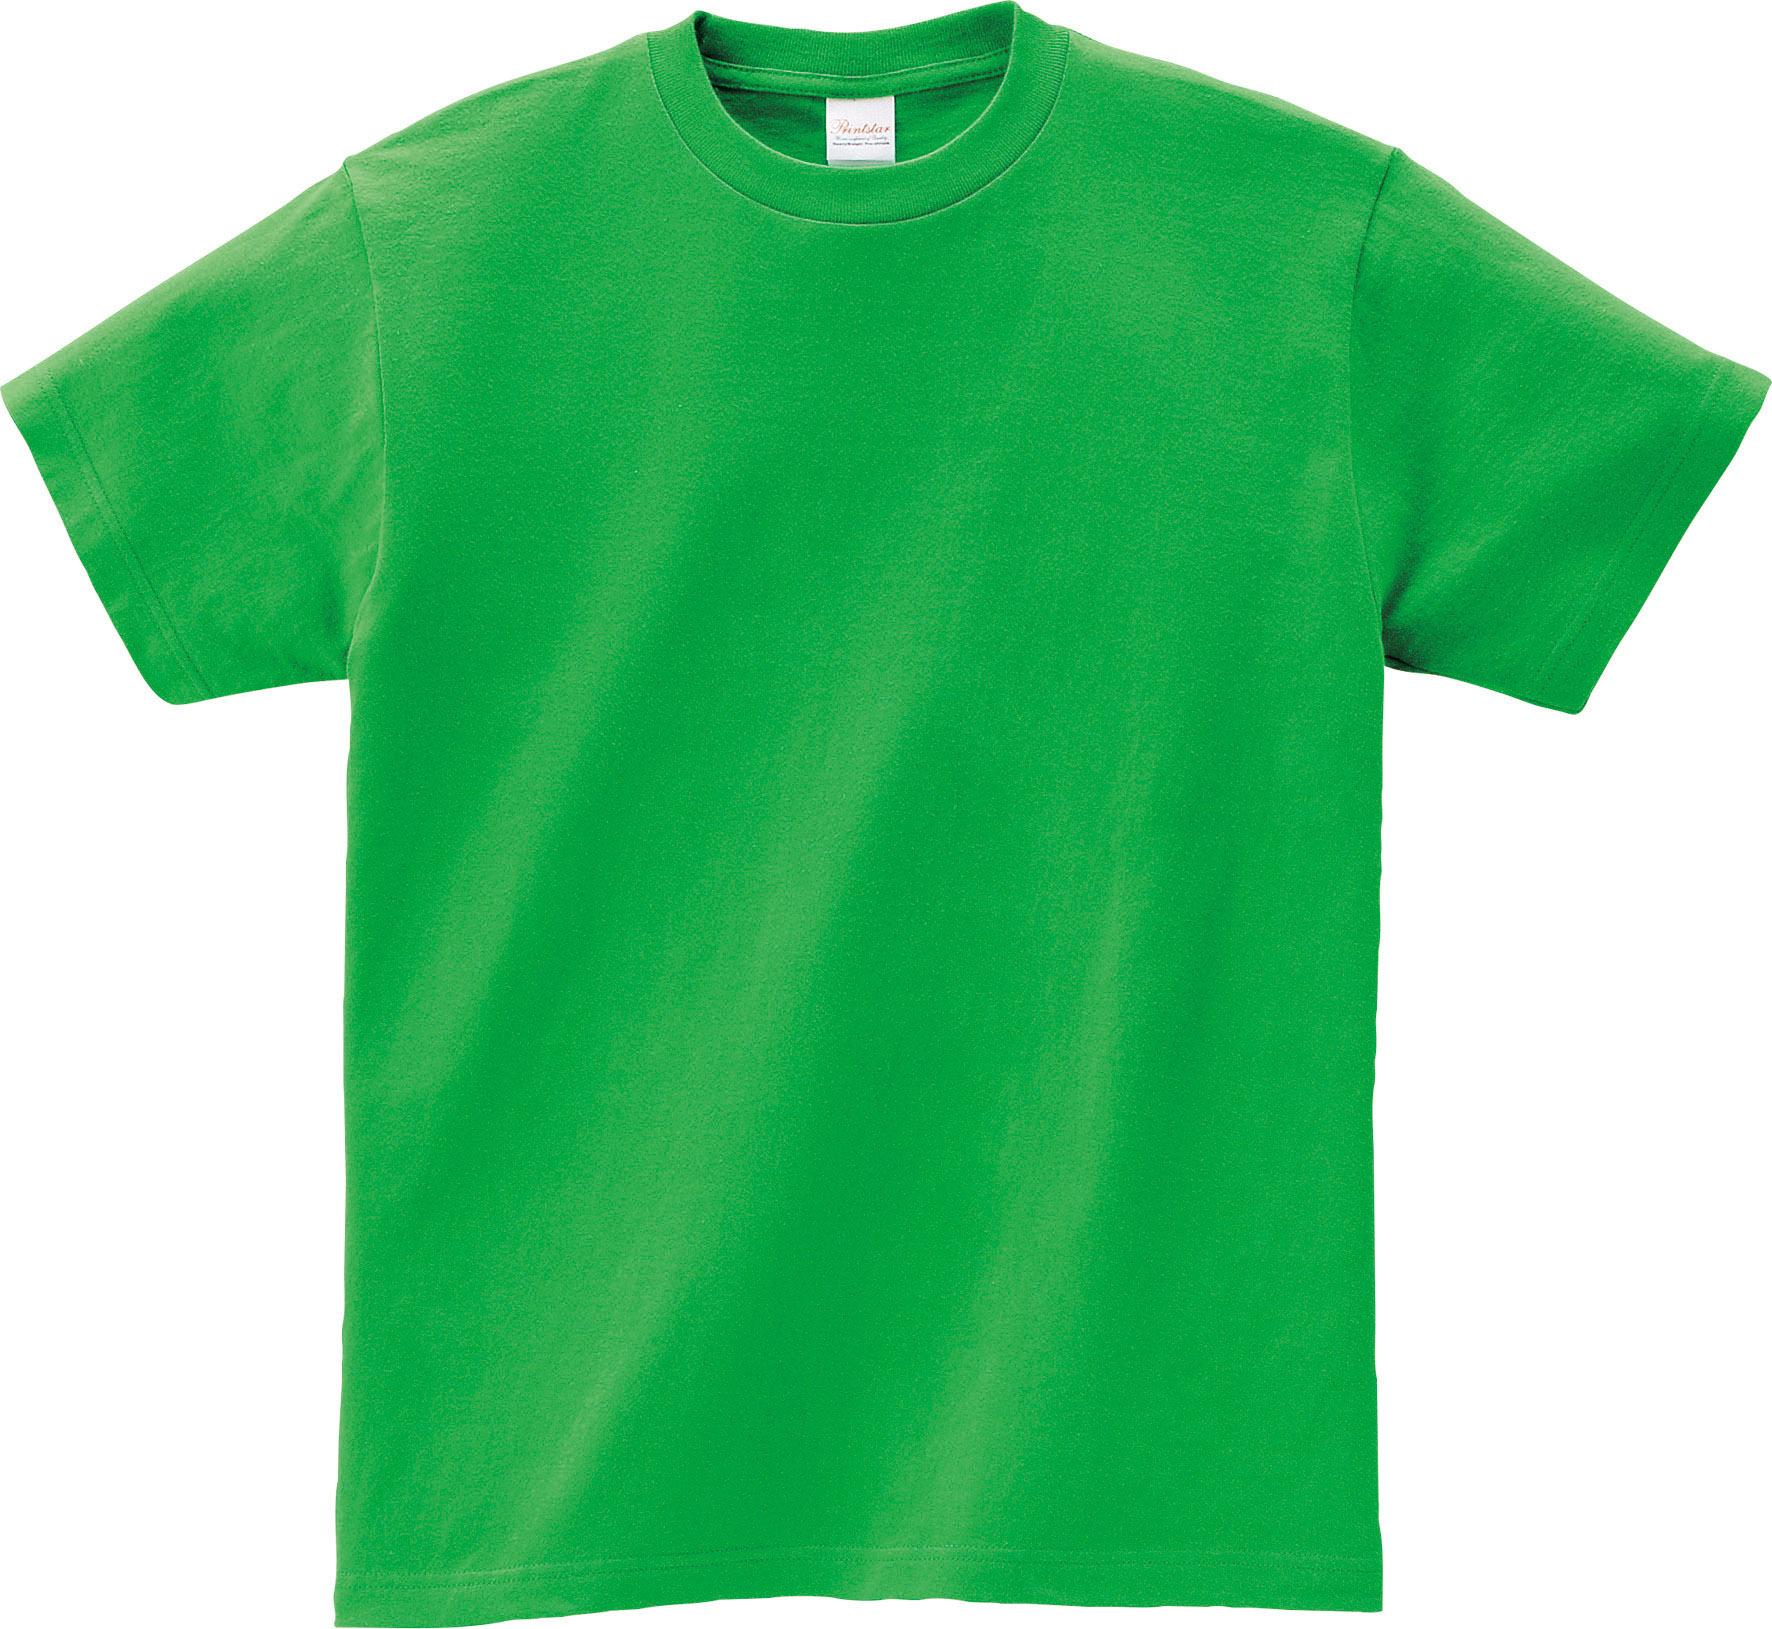 00085-CVT 5.6オンス・ヘビーウェイトTシャツ - 194-ブライトグリーン, XXXL